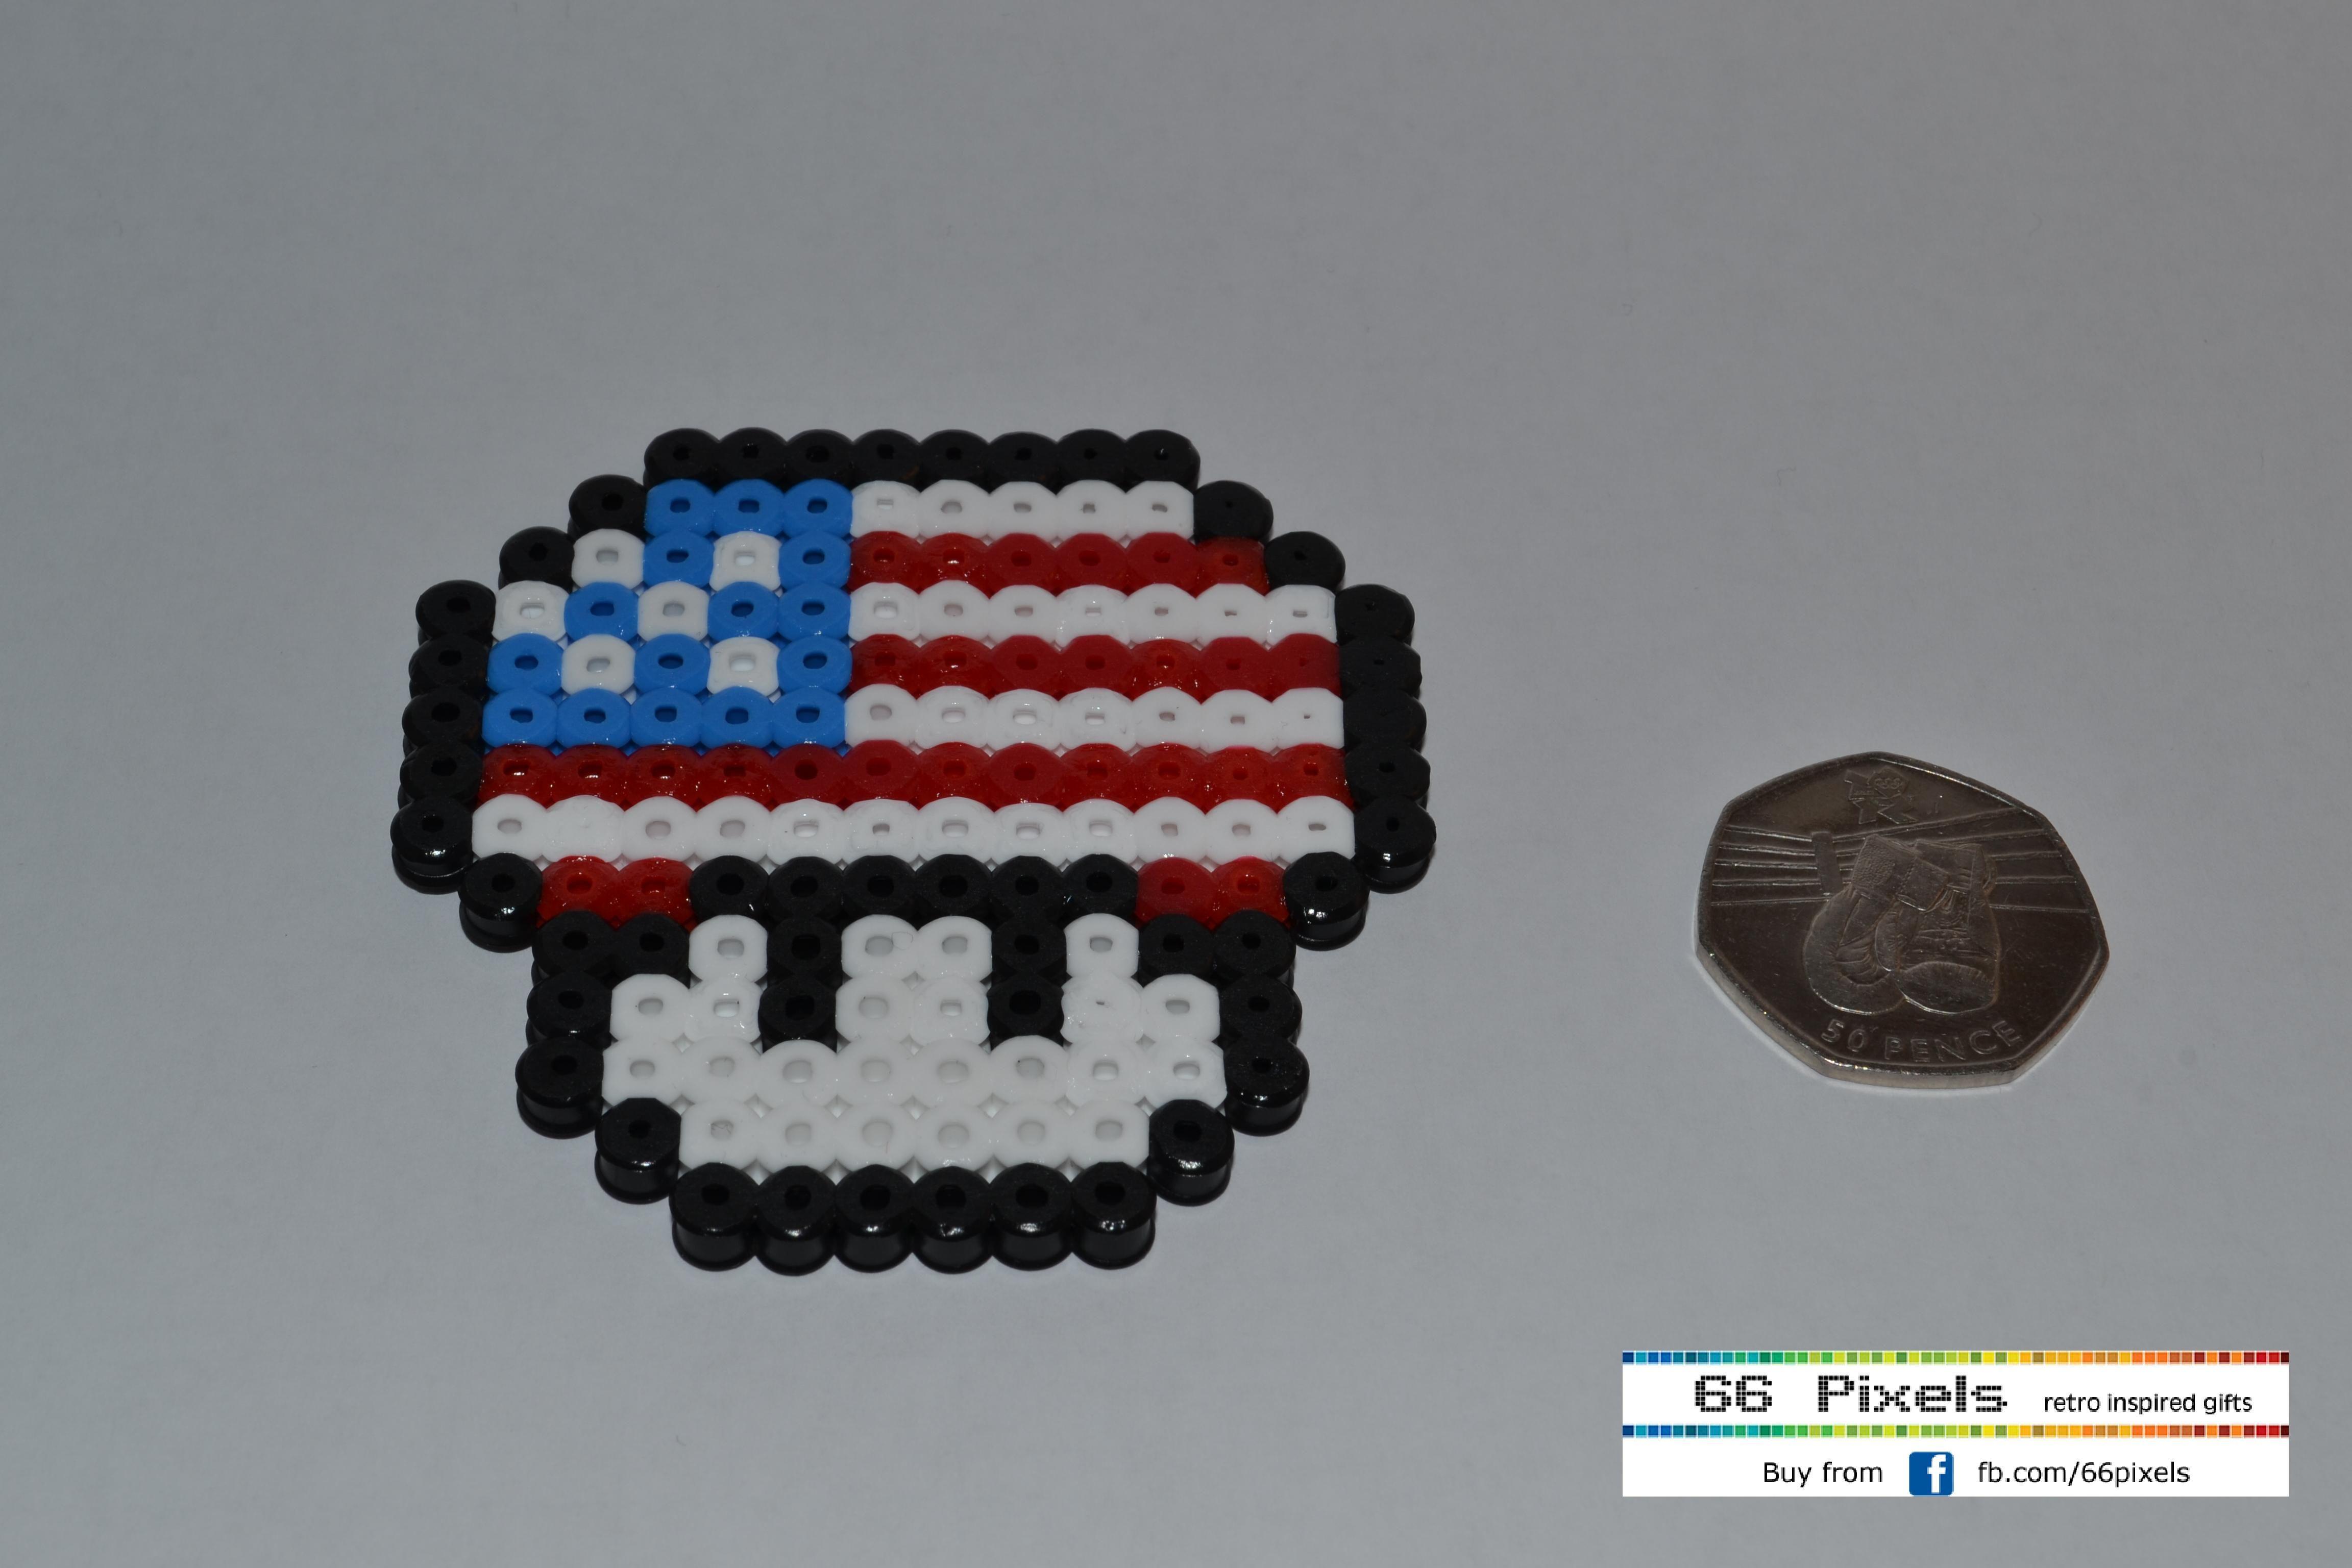 American mario mushroom coaster using perler/hama/fuse beads  by James Morgan - visit fb.com/66pixels